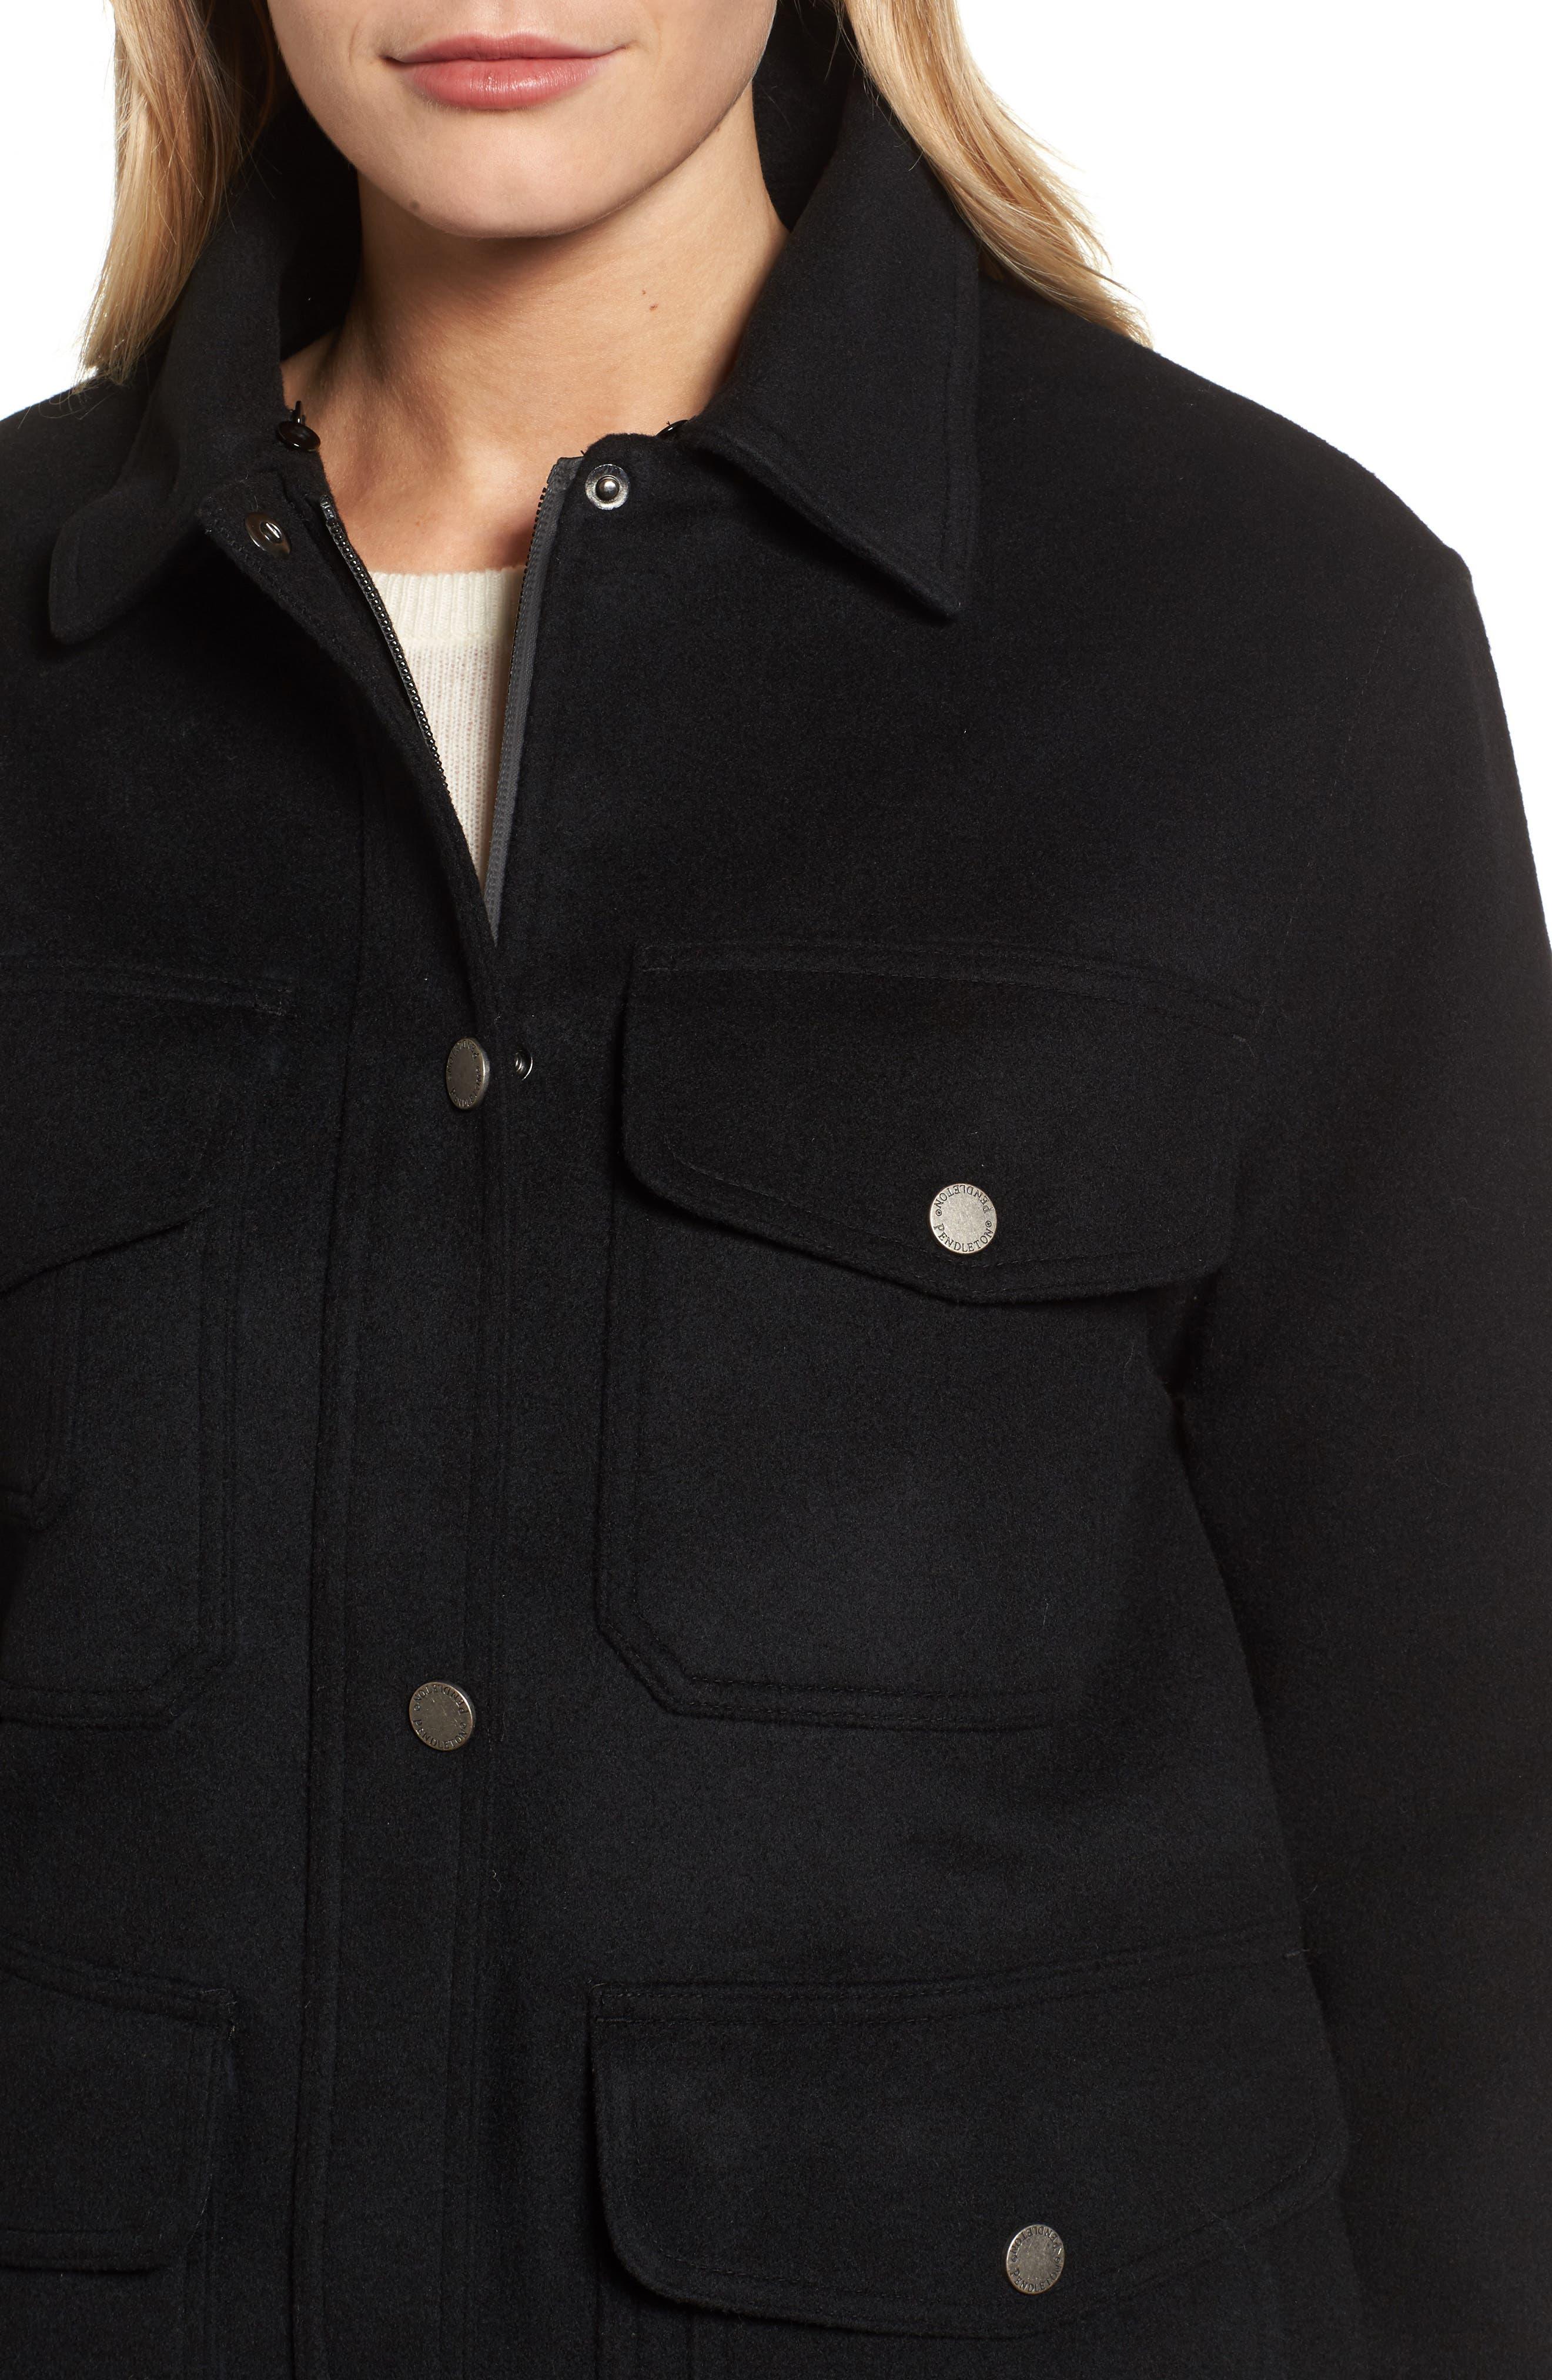 Manchester Waterproof Field Coat,                             Alternate thumbnail 4, color,                             Black